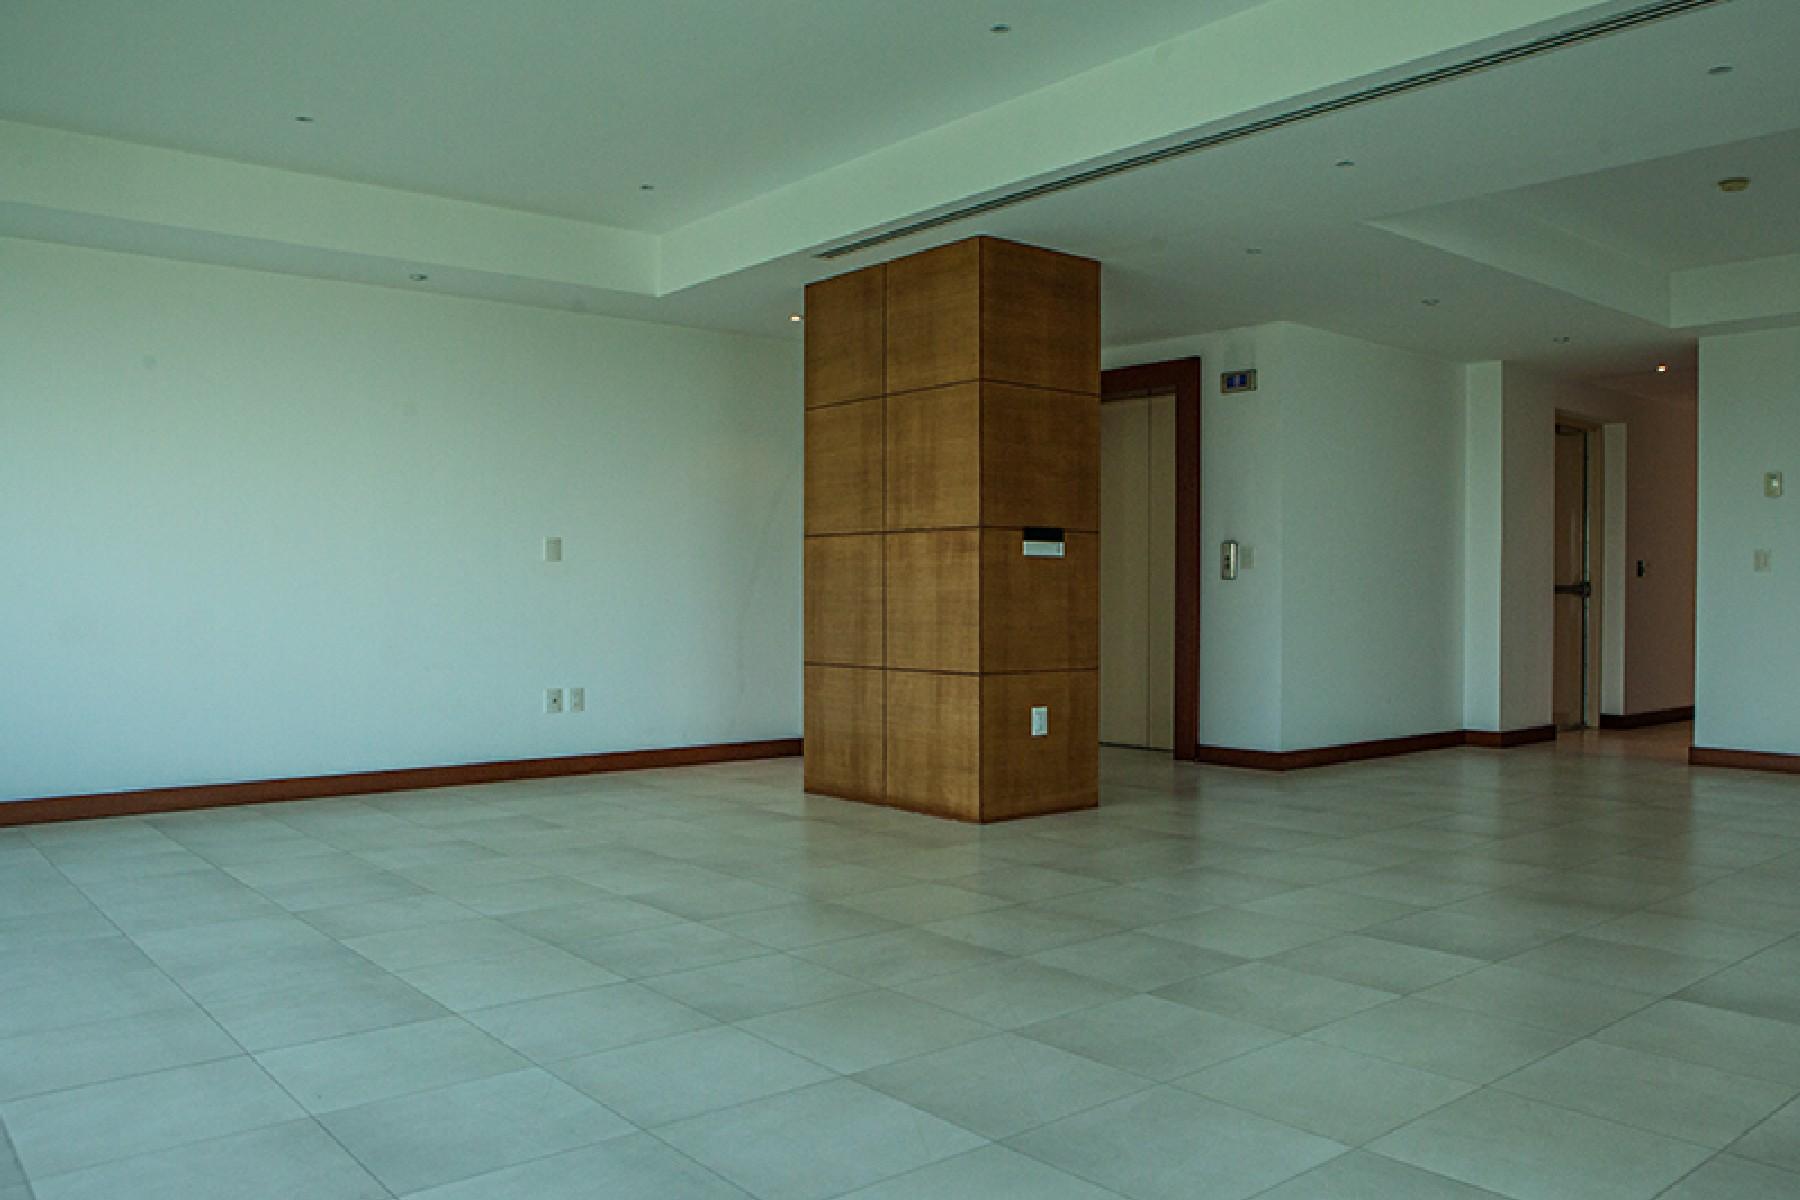 Additional photo for property listing at Torre Myth 1 - 07, Guadalajara Country Club Mar Tirreno 2136  1-07 Guadalajara, Jalisco 44610 Mexico